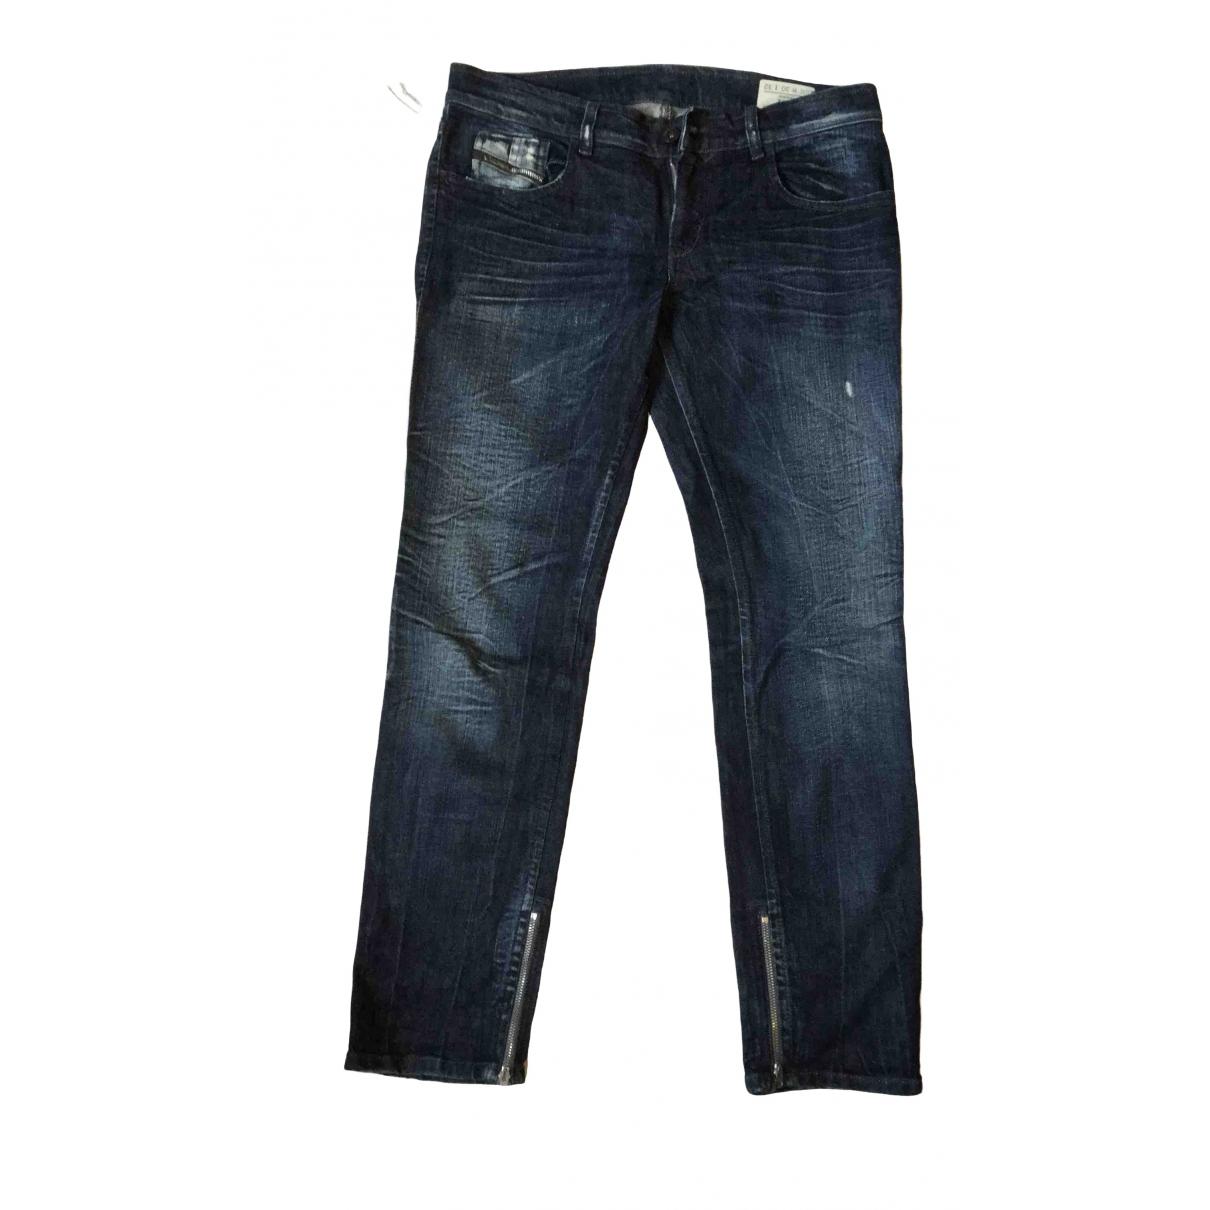 Diesel \N Blue Denim - Jeans Trousers for Women M International